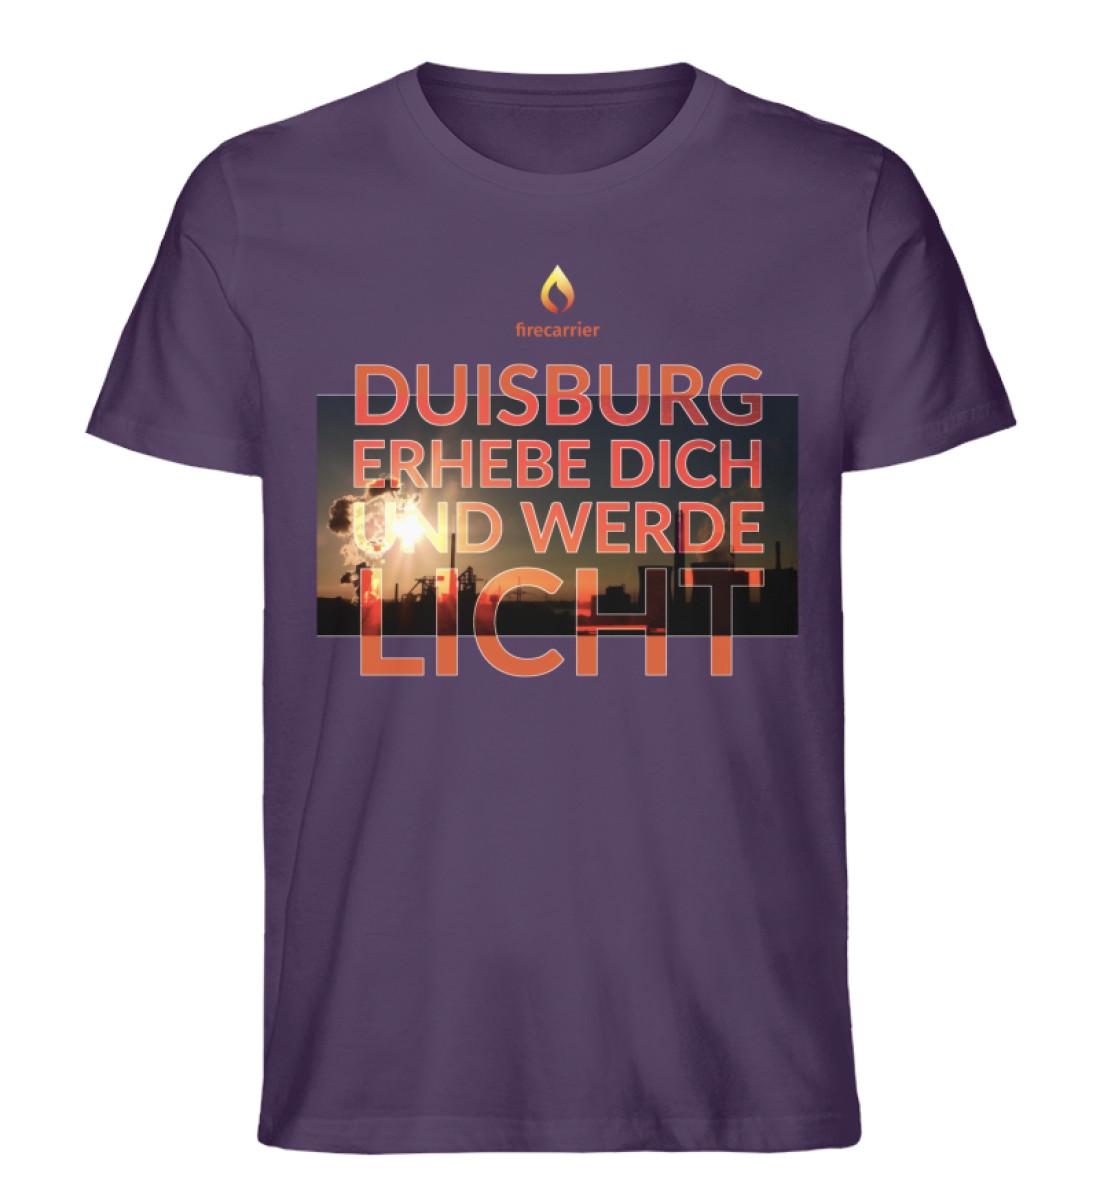 duisburg - Herren Premium Organic Shirt-6876